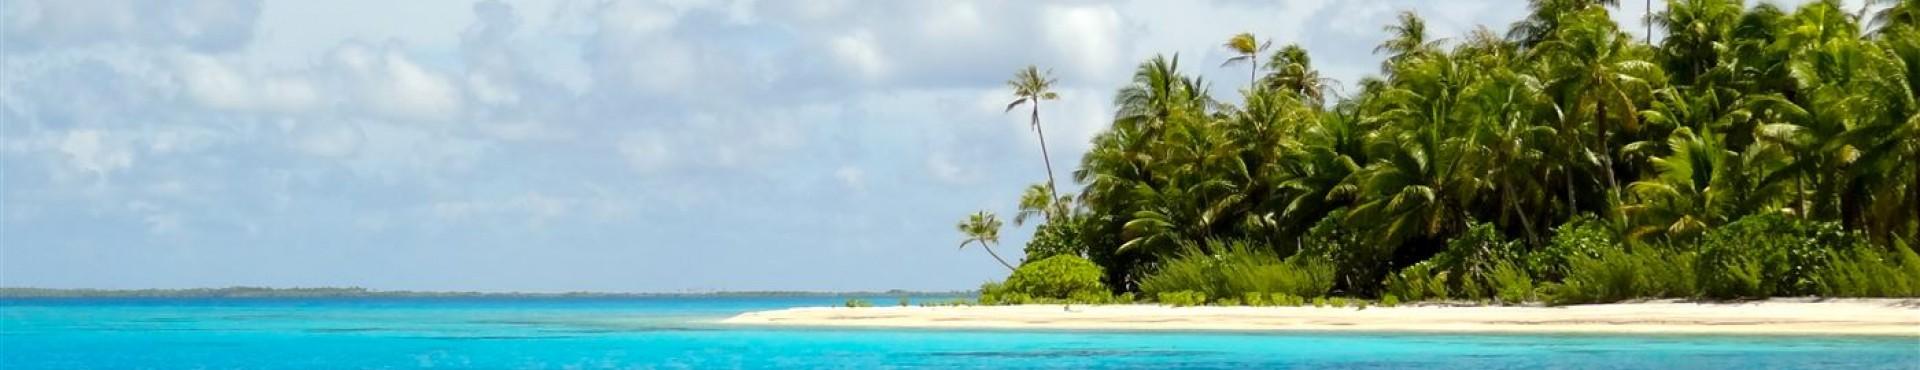 Fakarava urlaub im s dseeparadies polynesia select for Rangiroa urlaub